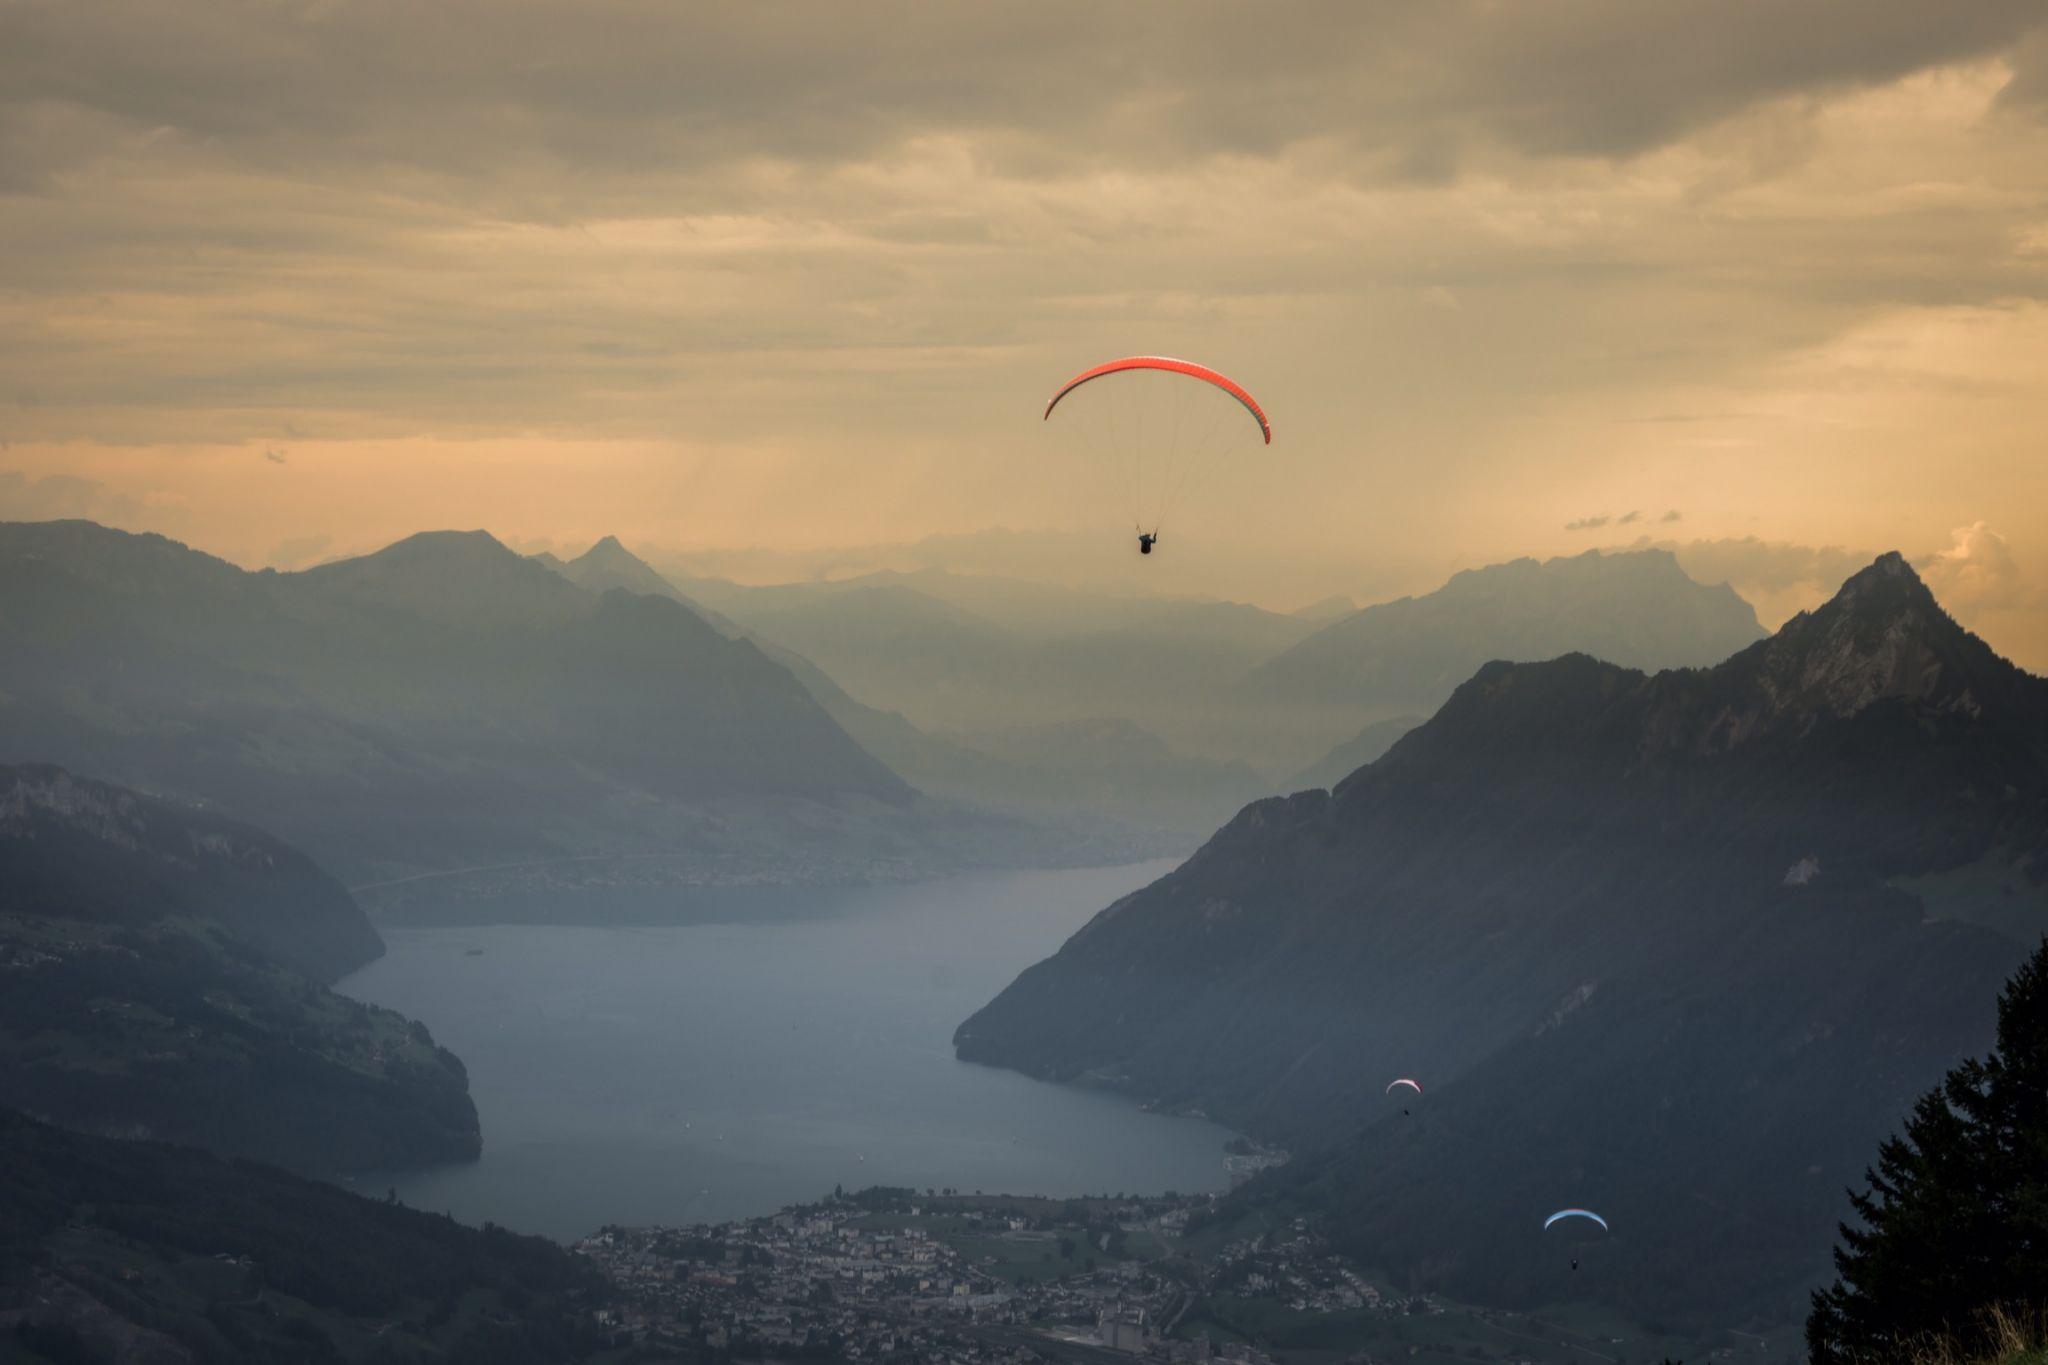 Paragliders above Lake Lucerne, Switzerland